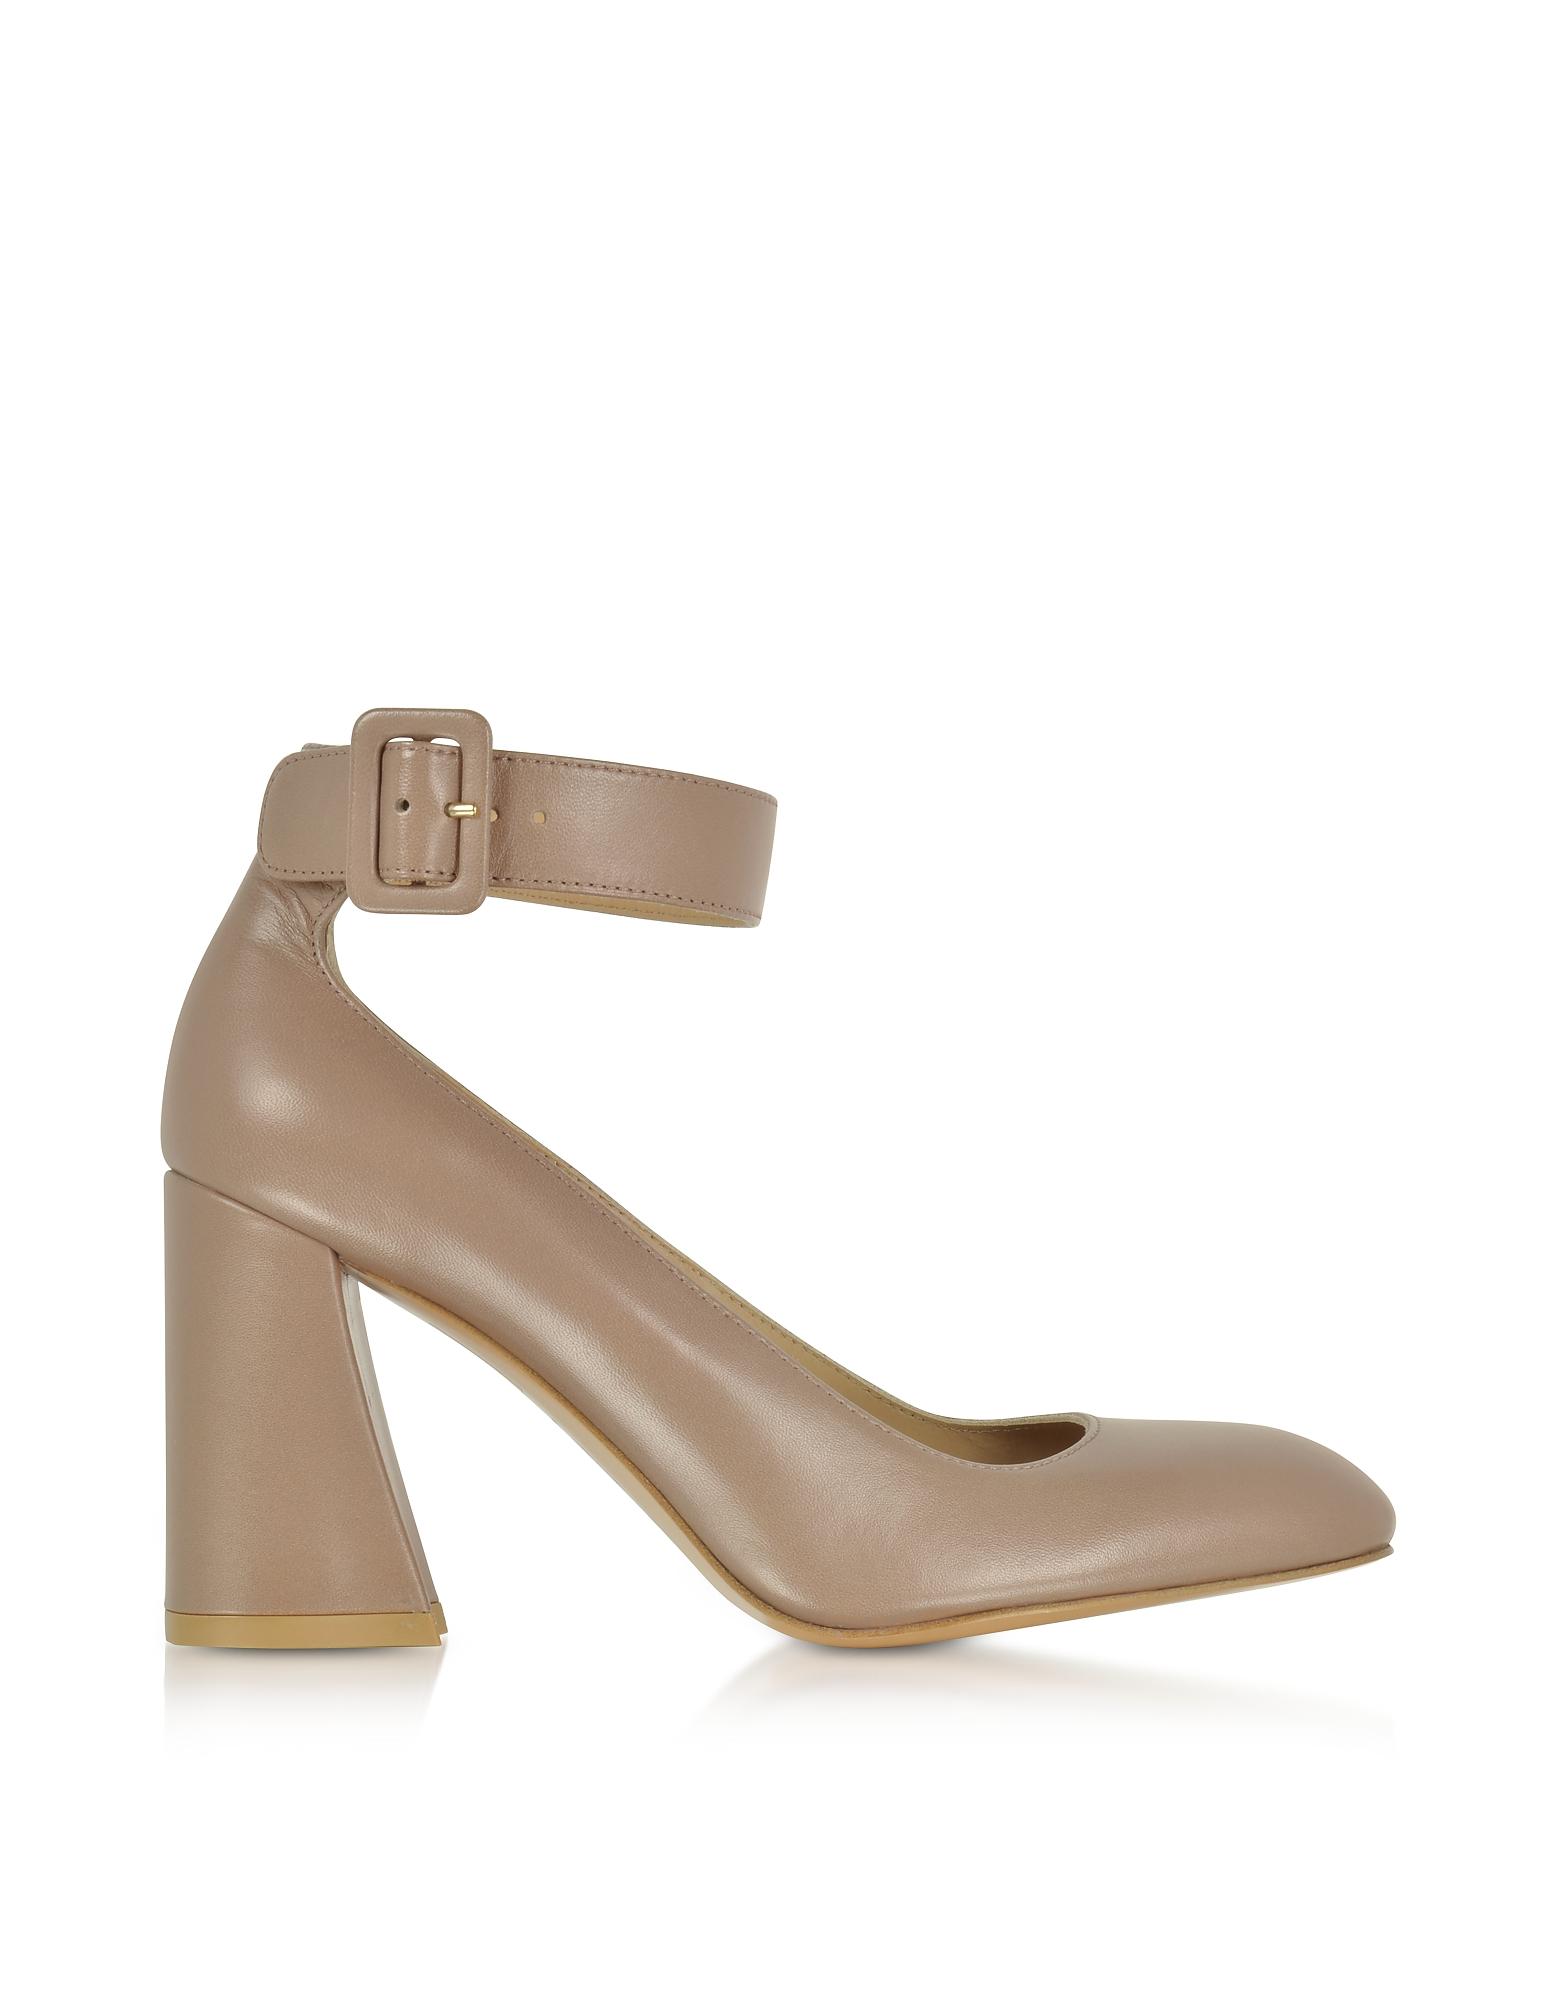 Stuart Weitzman Shoes, Clarisa Mouse Nappa Leather Ankle Strap Pumps